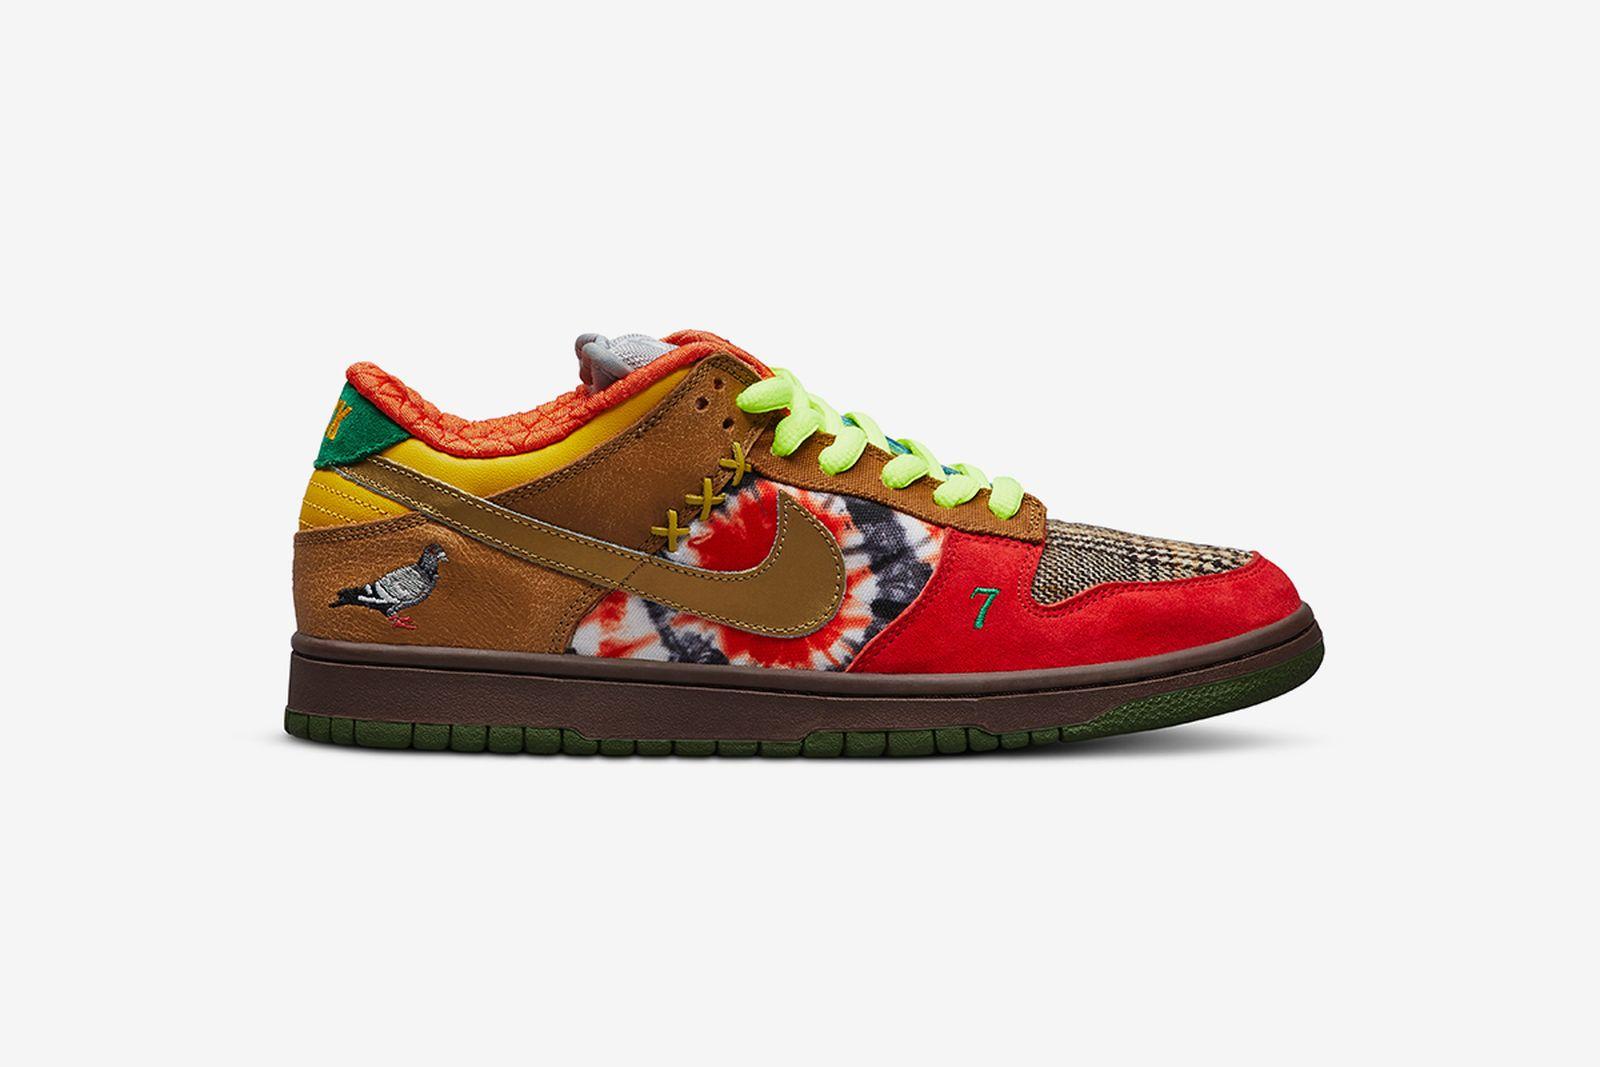 sothebys-nike-sneaker-auction-07